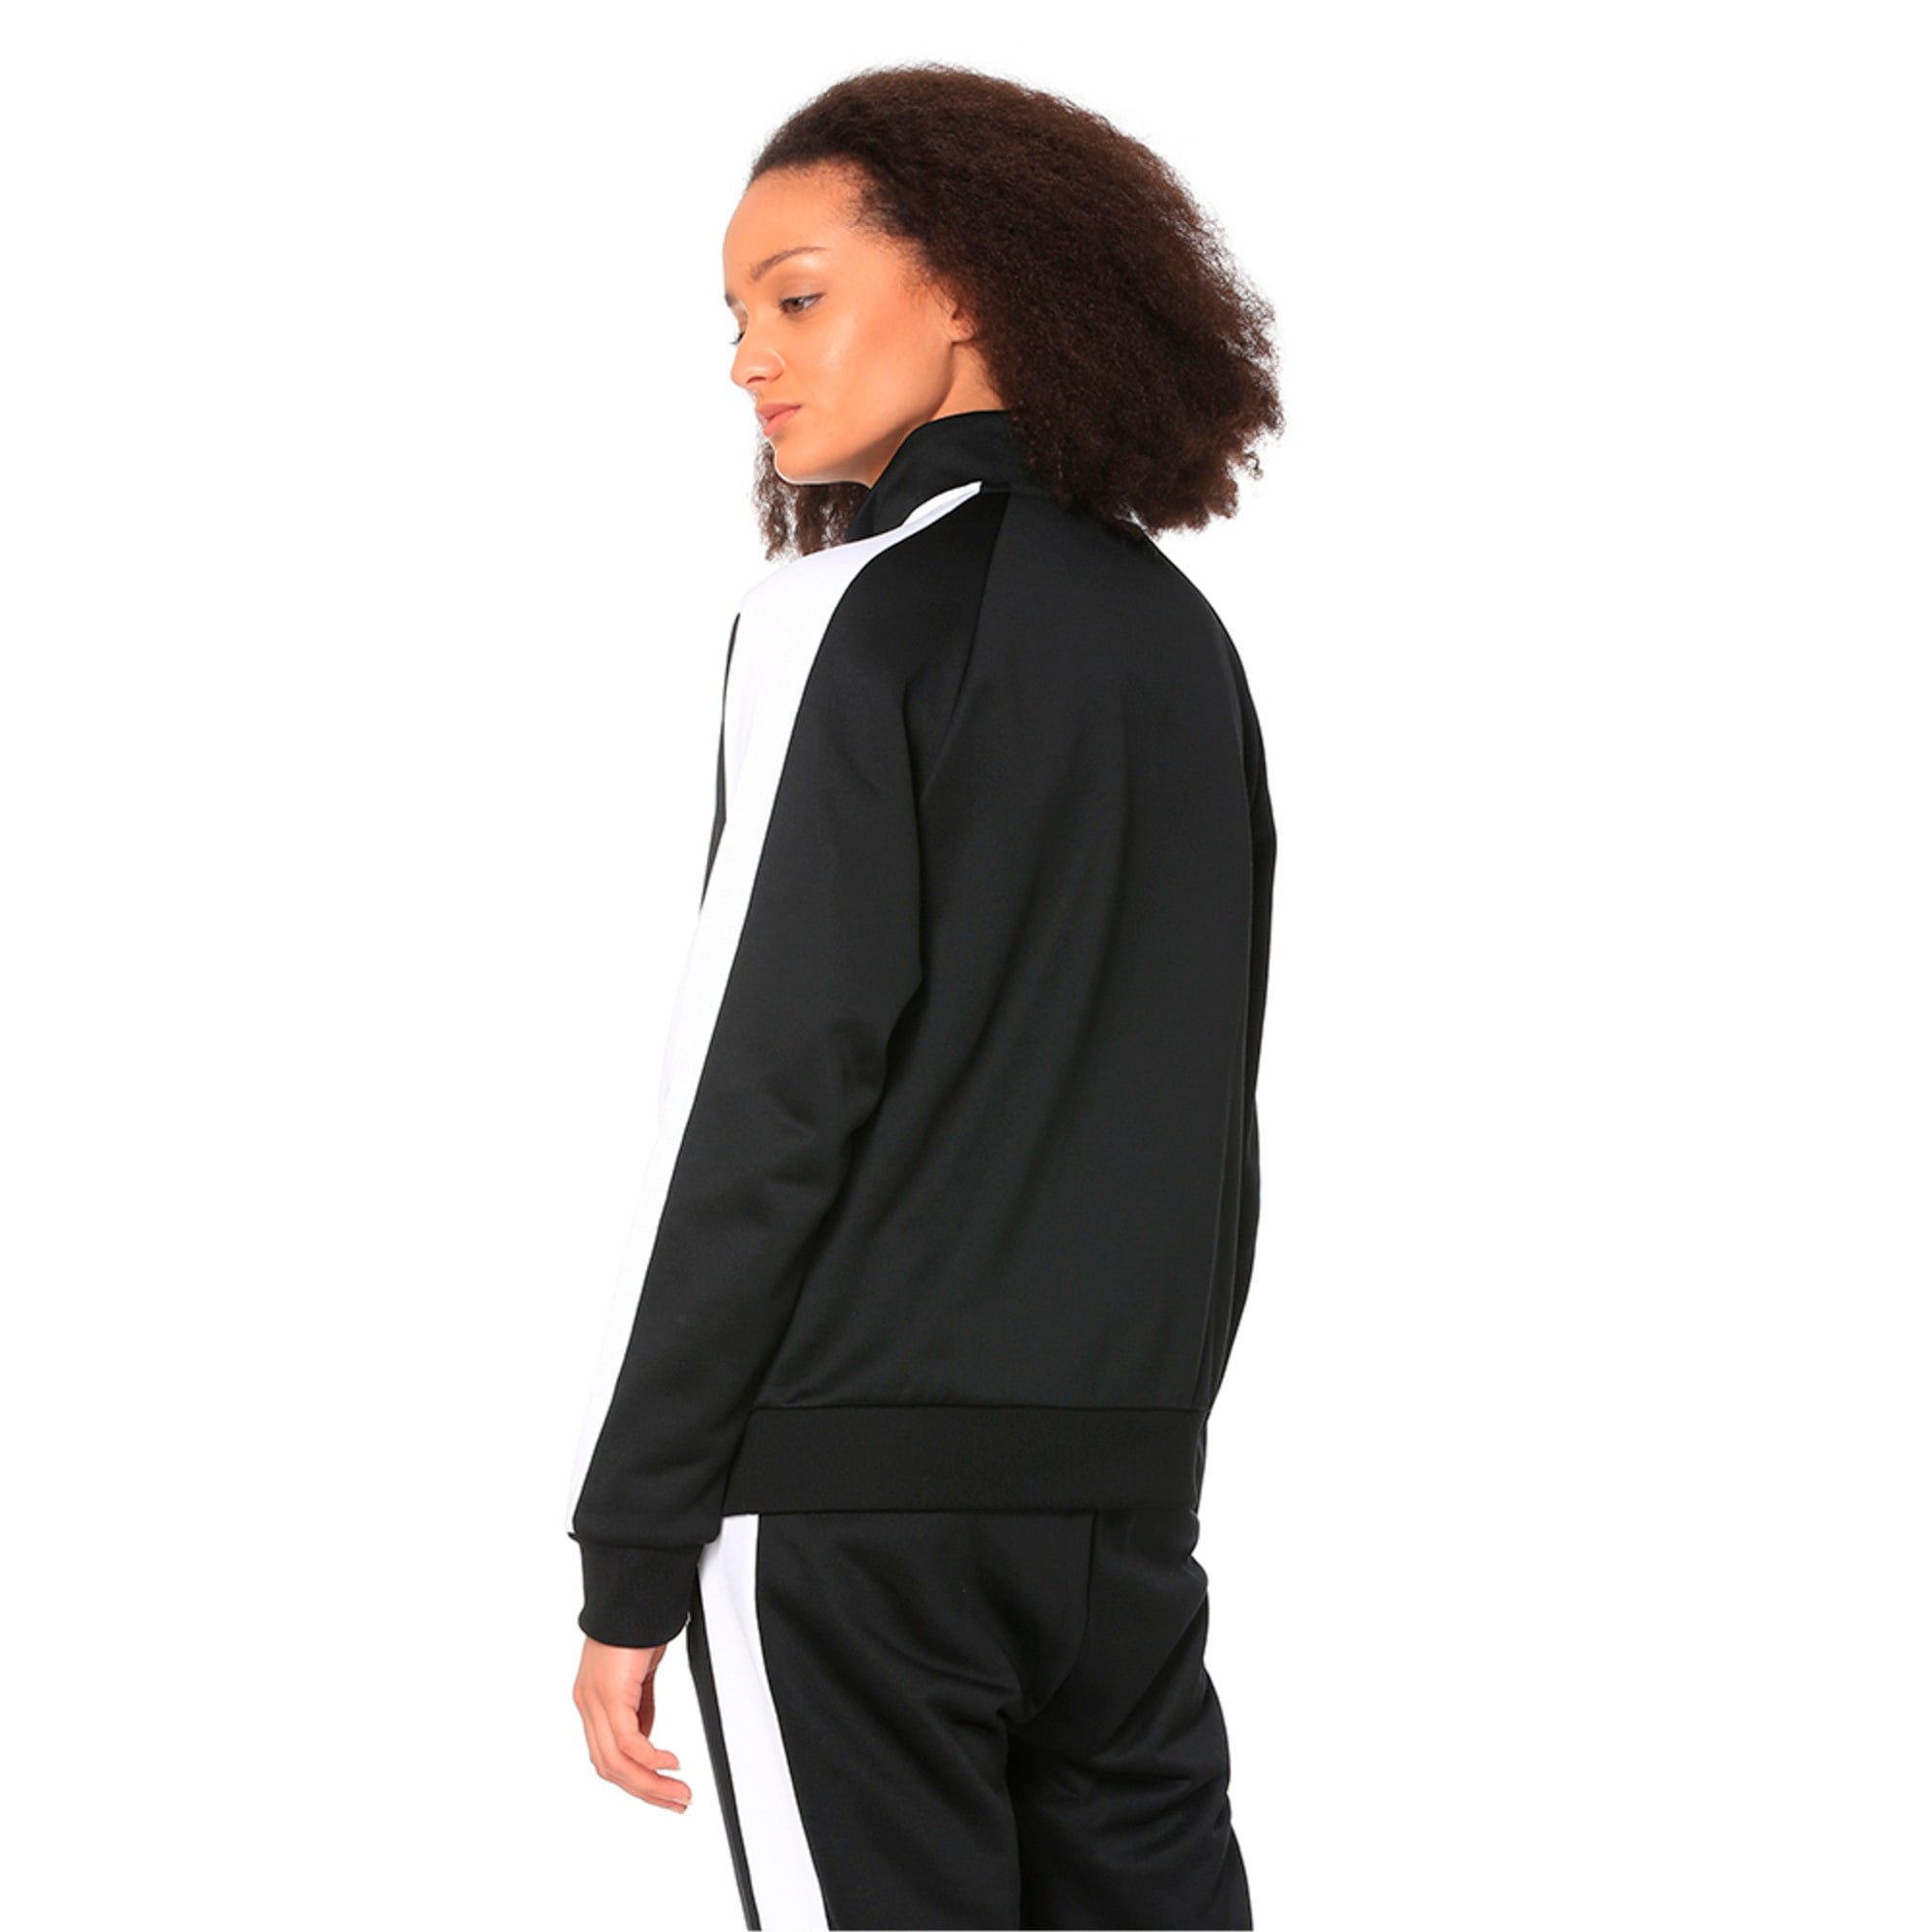 Thumbnail 2 of Classics T7 PT Women's Track Jacket, Puma Black-1, medium-IND